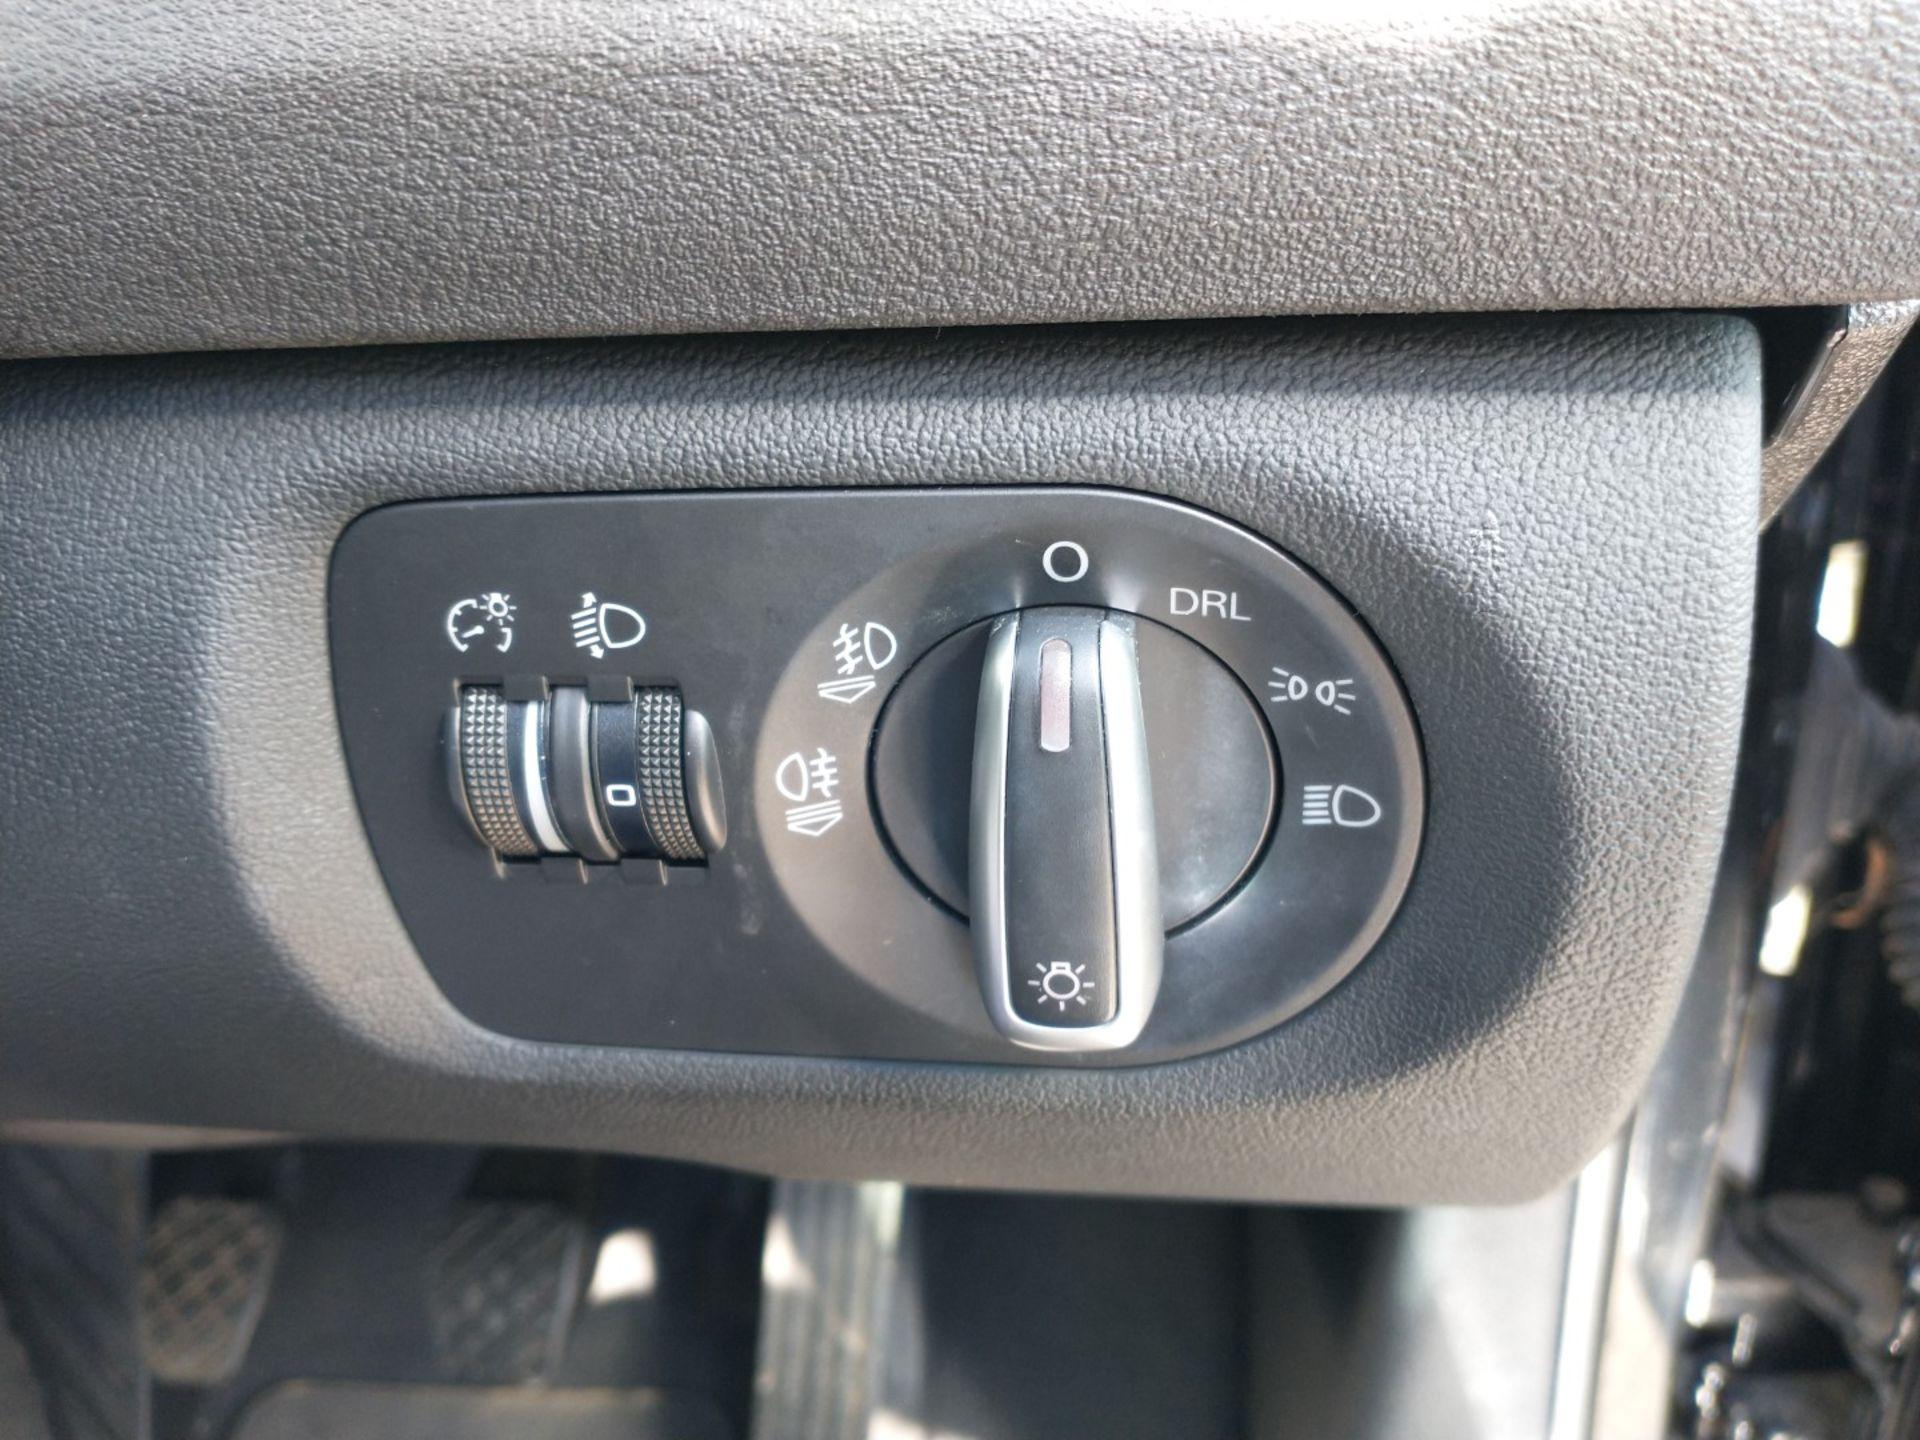 2012 Audi A3 Sportback 1.6 Tdi Hatchback - Full Service History - CL505 - NO VAT ON THE HAMMER - - Image 24 of 26